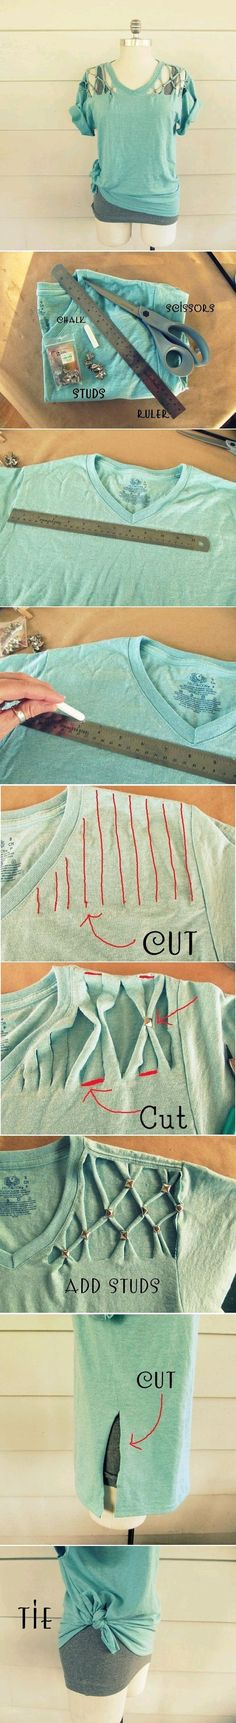 DIY cut+studded shirt